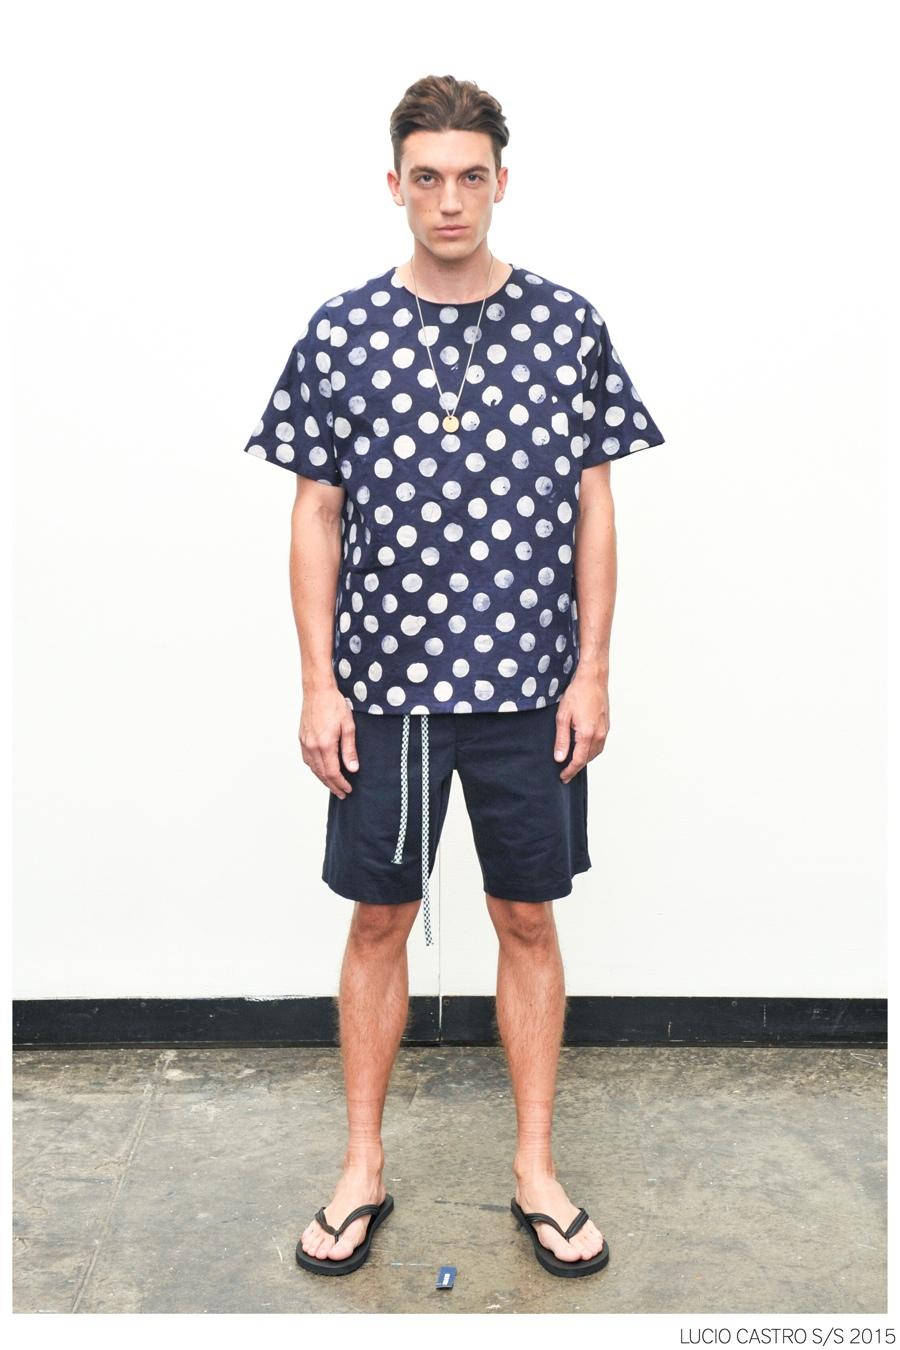 Lucio Castro Spring/Summer 2015 | New York Fashion Week